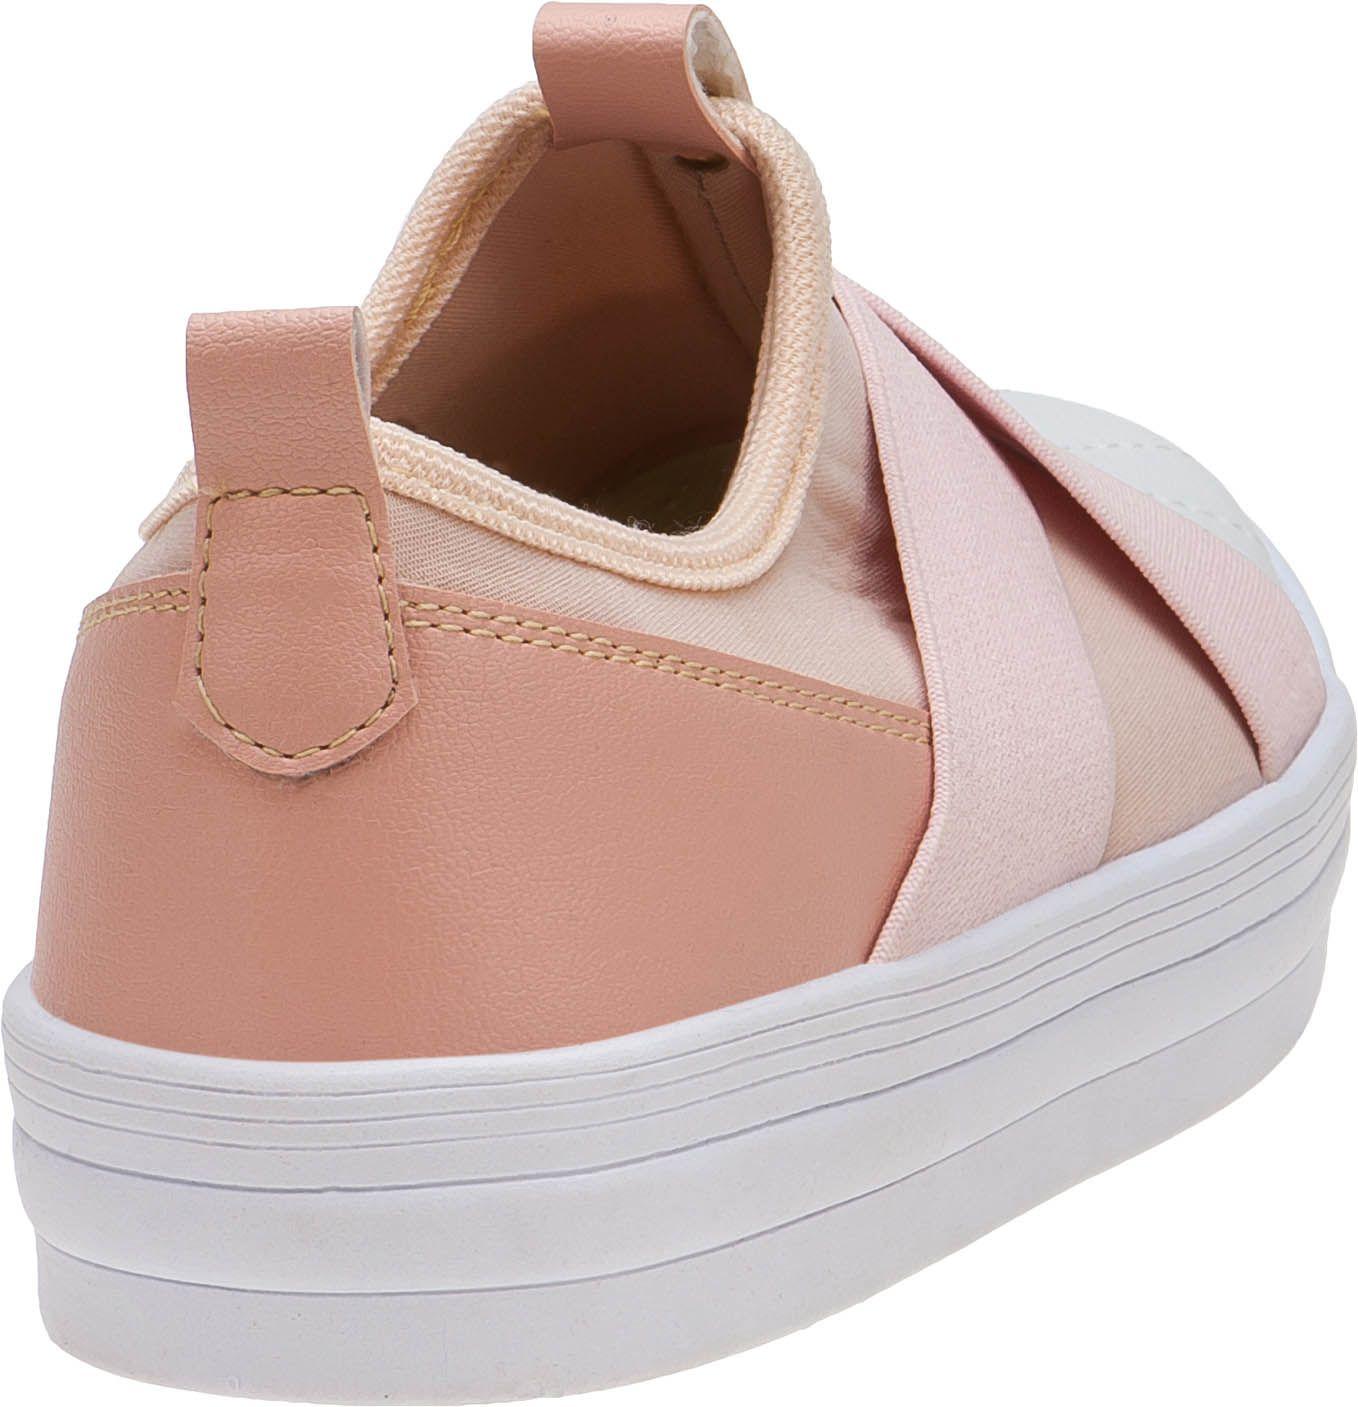 Tênis Menina Fashion Feminino Infantil Slip On Elástico Casual 155.201.041   Rosa